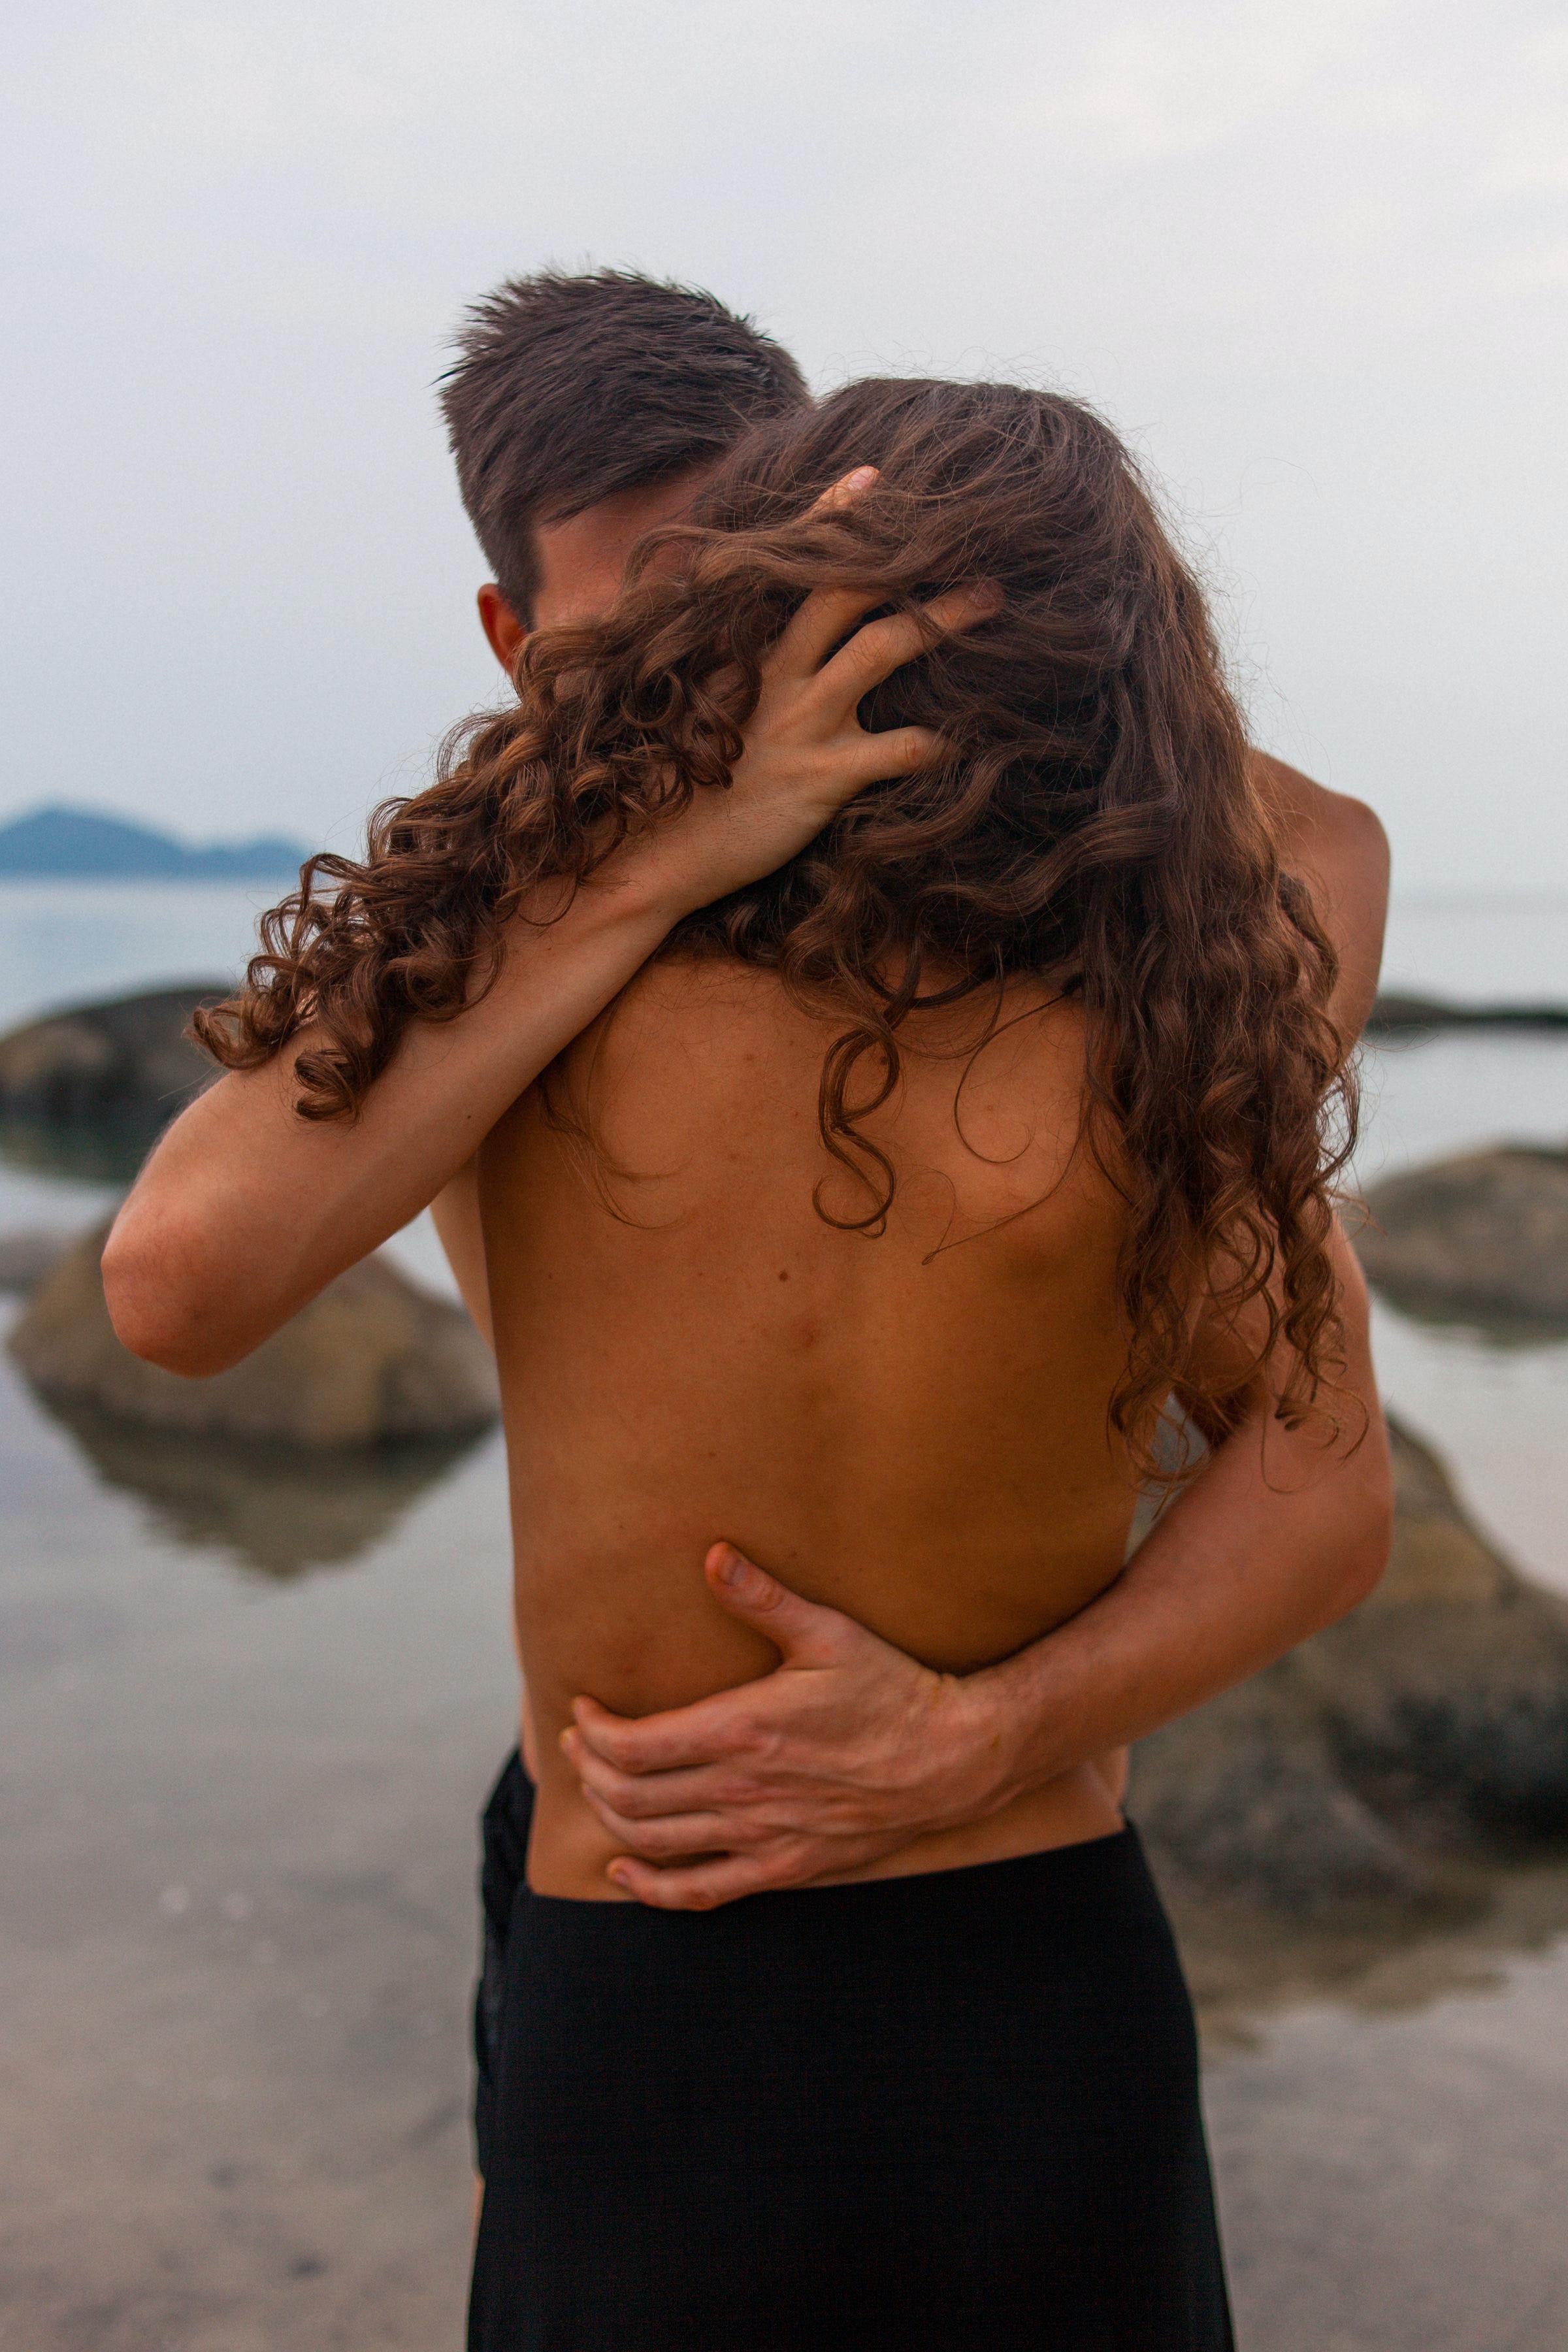 Couples Relationship Coaching